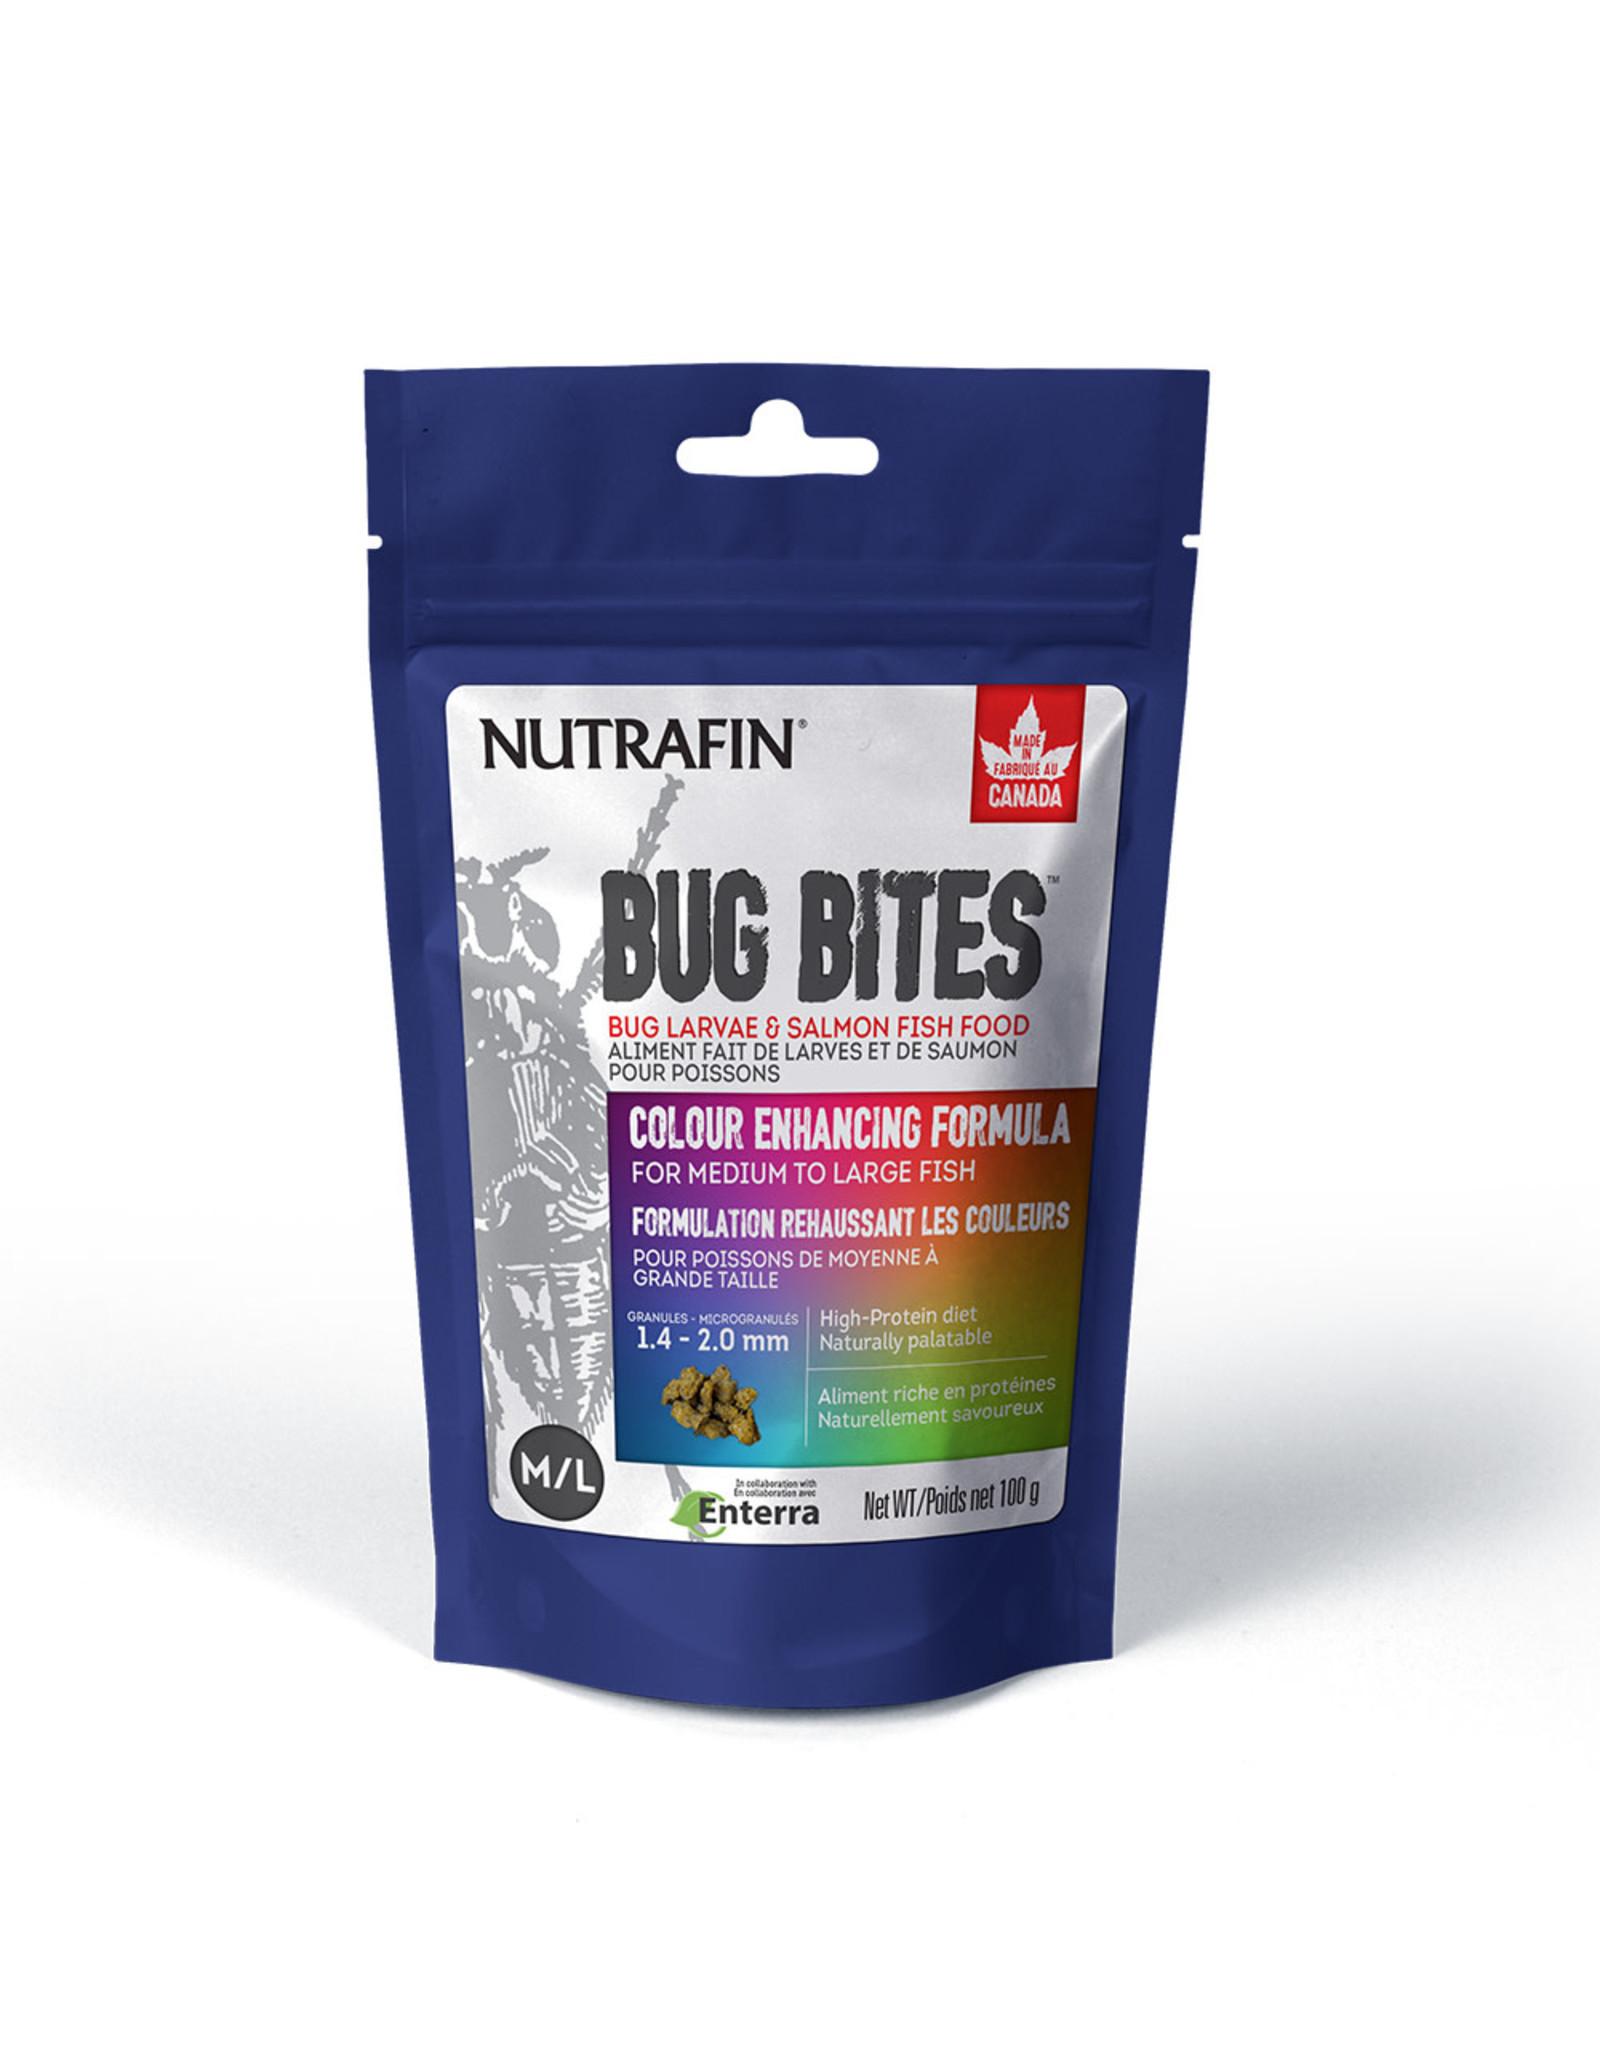 Nutrafin Bug Bites Colour Enhancing Formula Medium to Large Fish 1.4-2.0mm granules 100g (3.5oz)